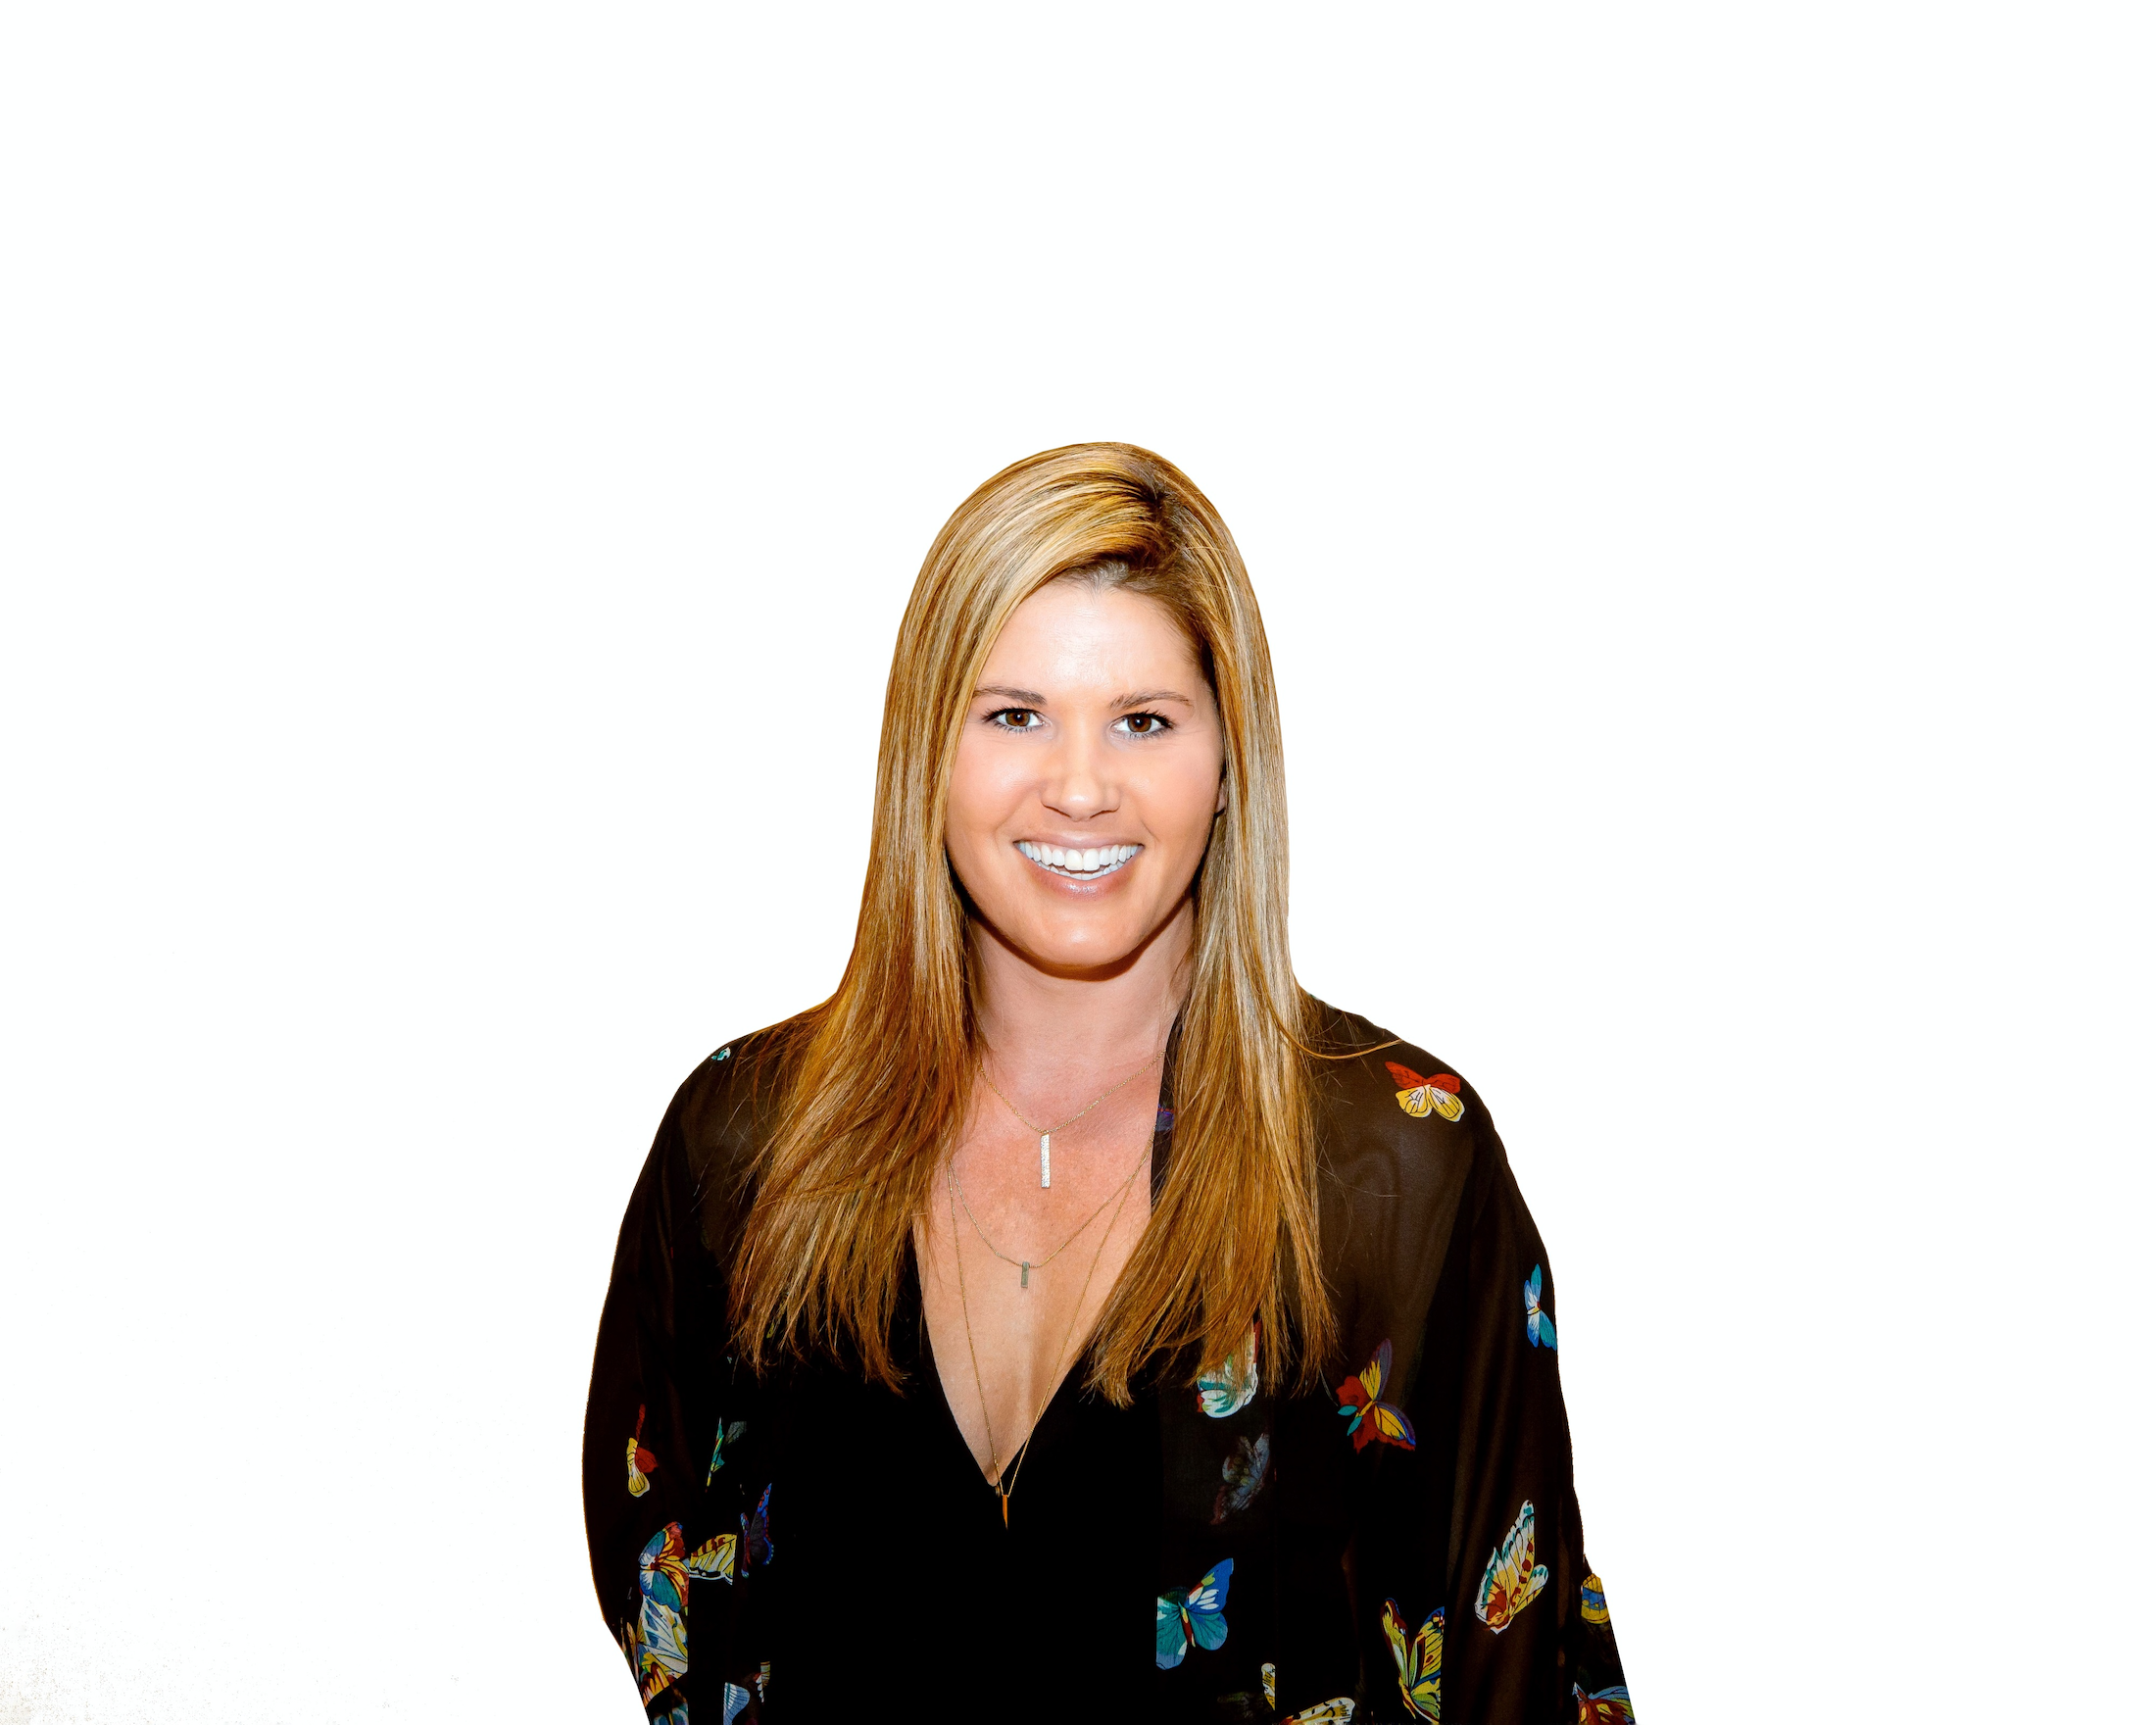 Lindsay Schweigler